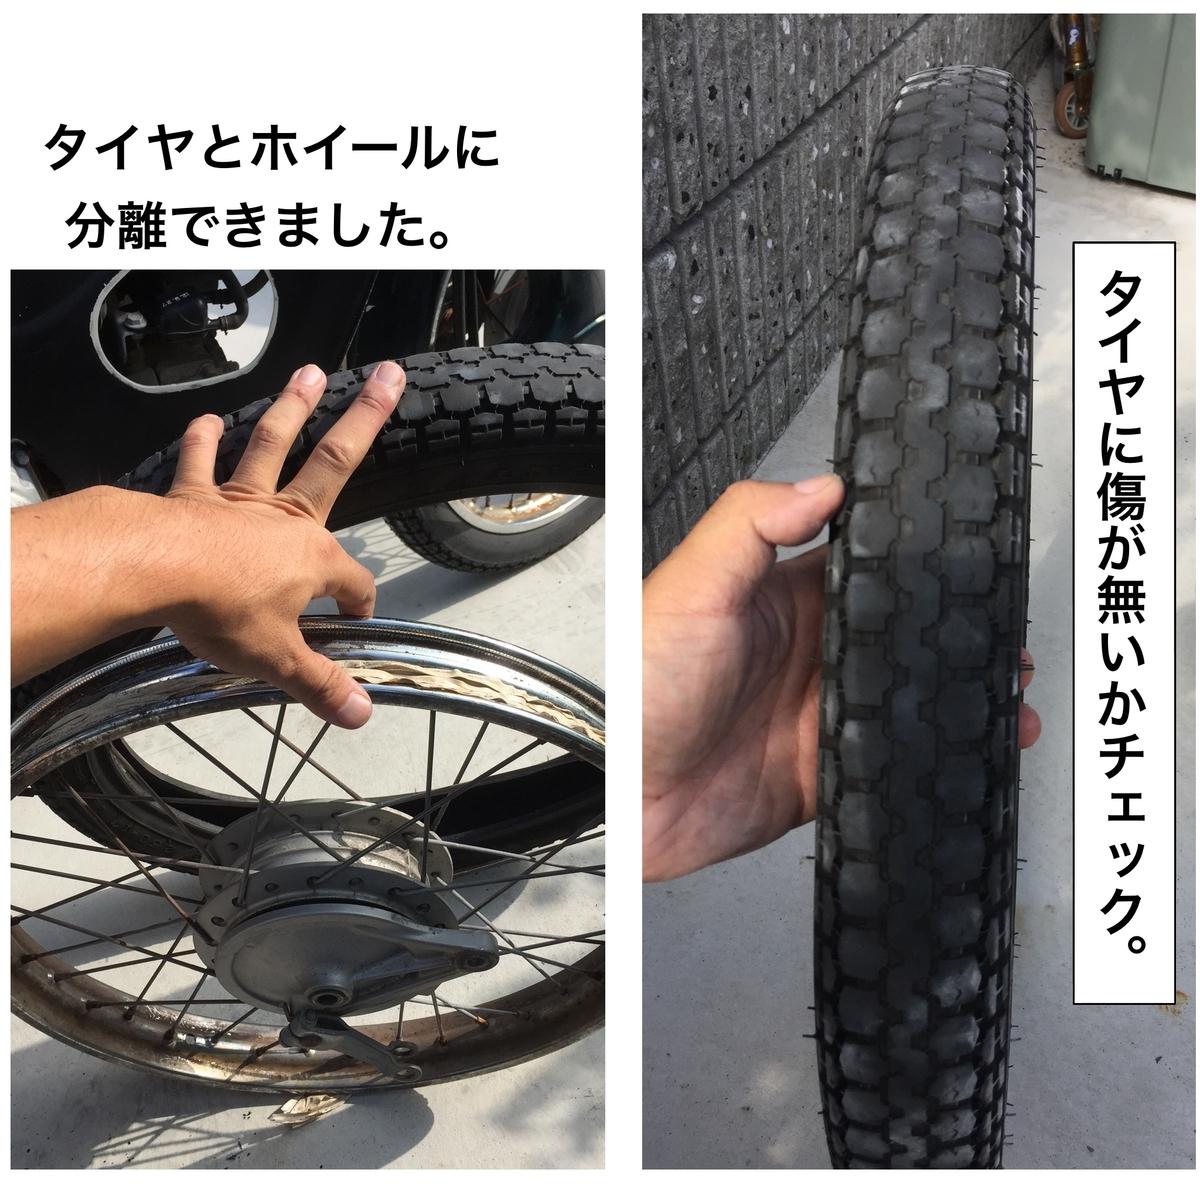 f:id:gomateishoku:20190916231558j:plain